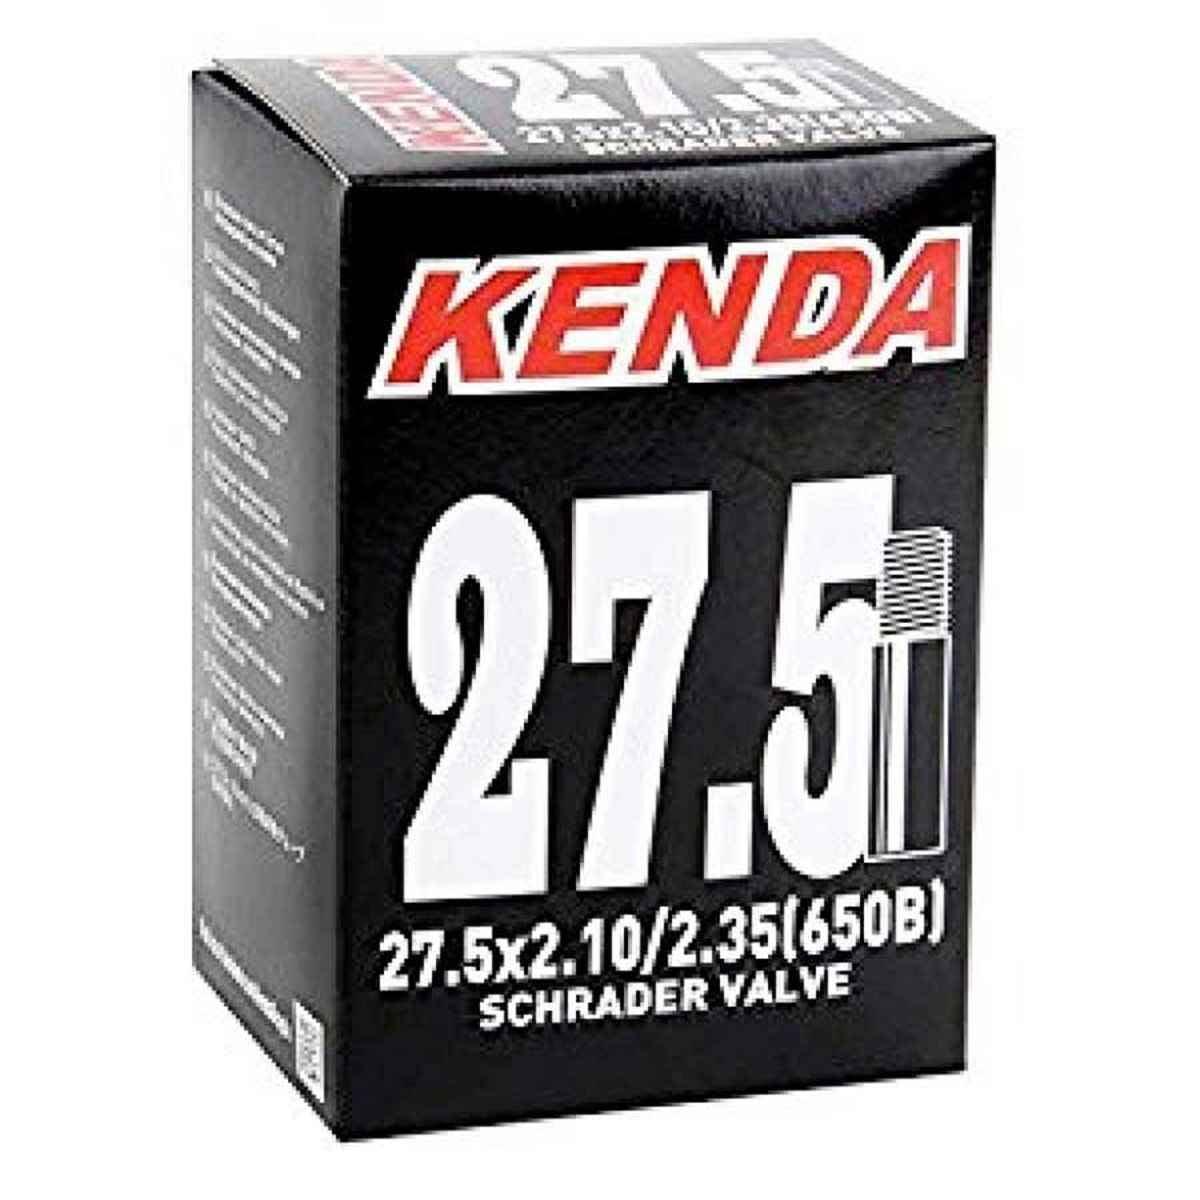 Kenda, Schrader, Tube, Schrader, Length: 48mm, 700C, 30-43C - 12700012